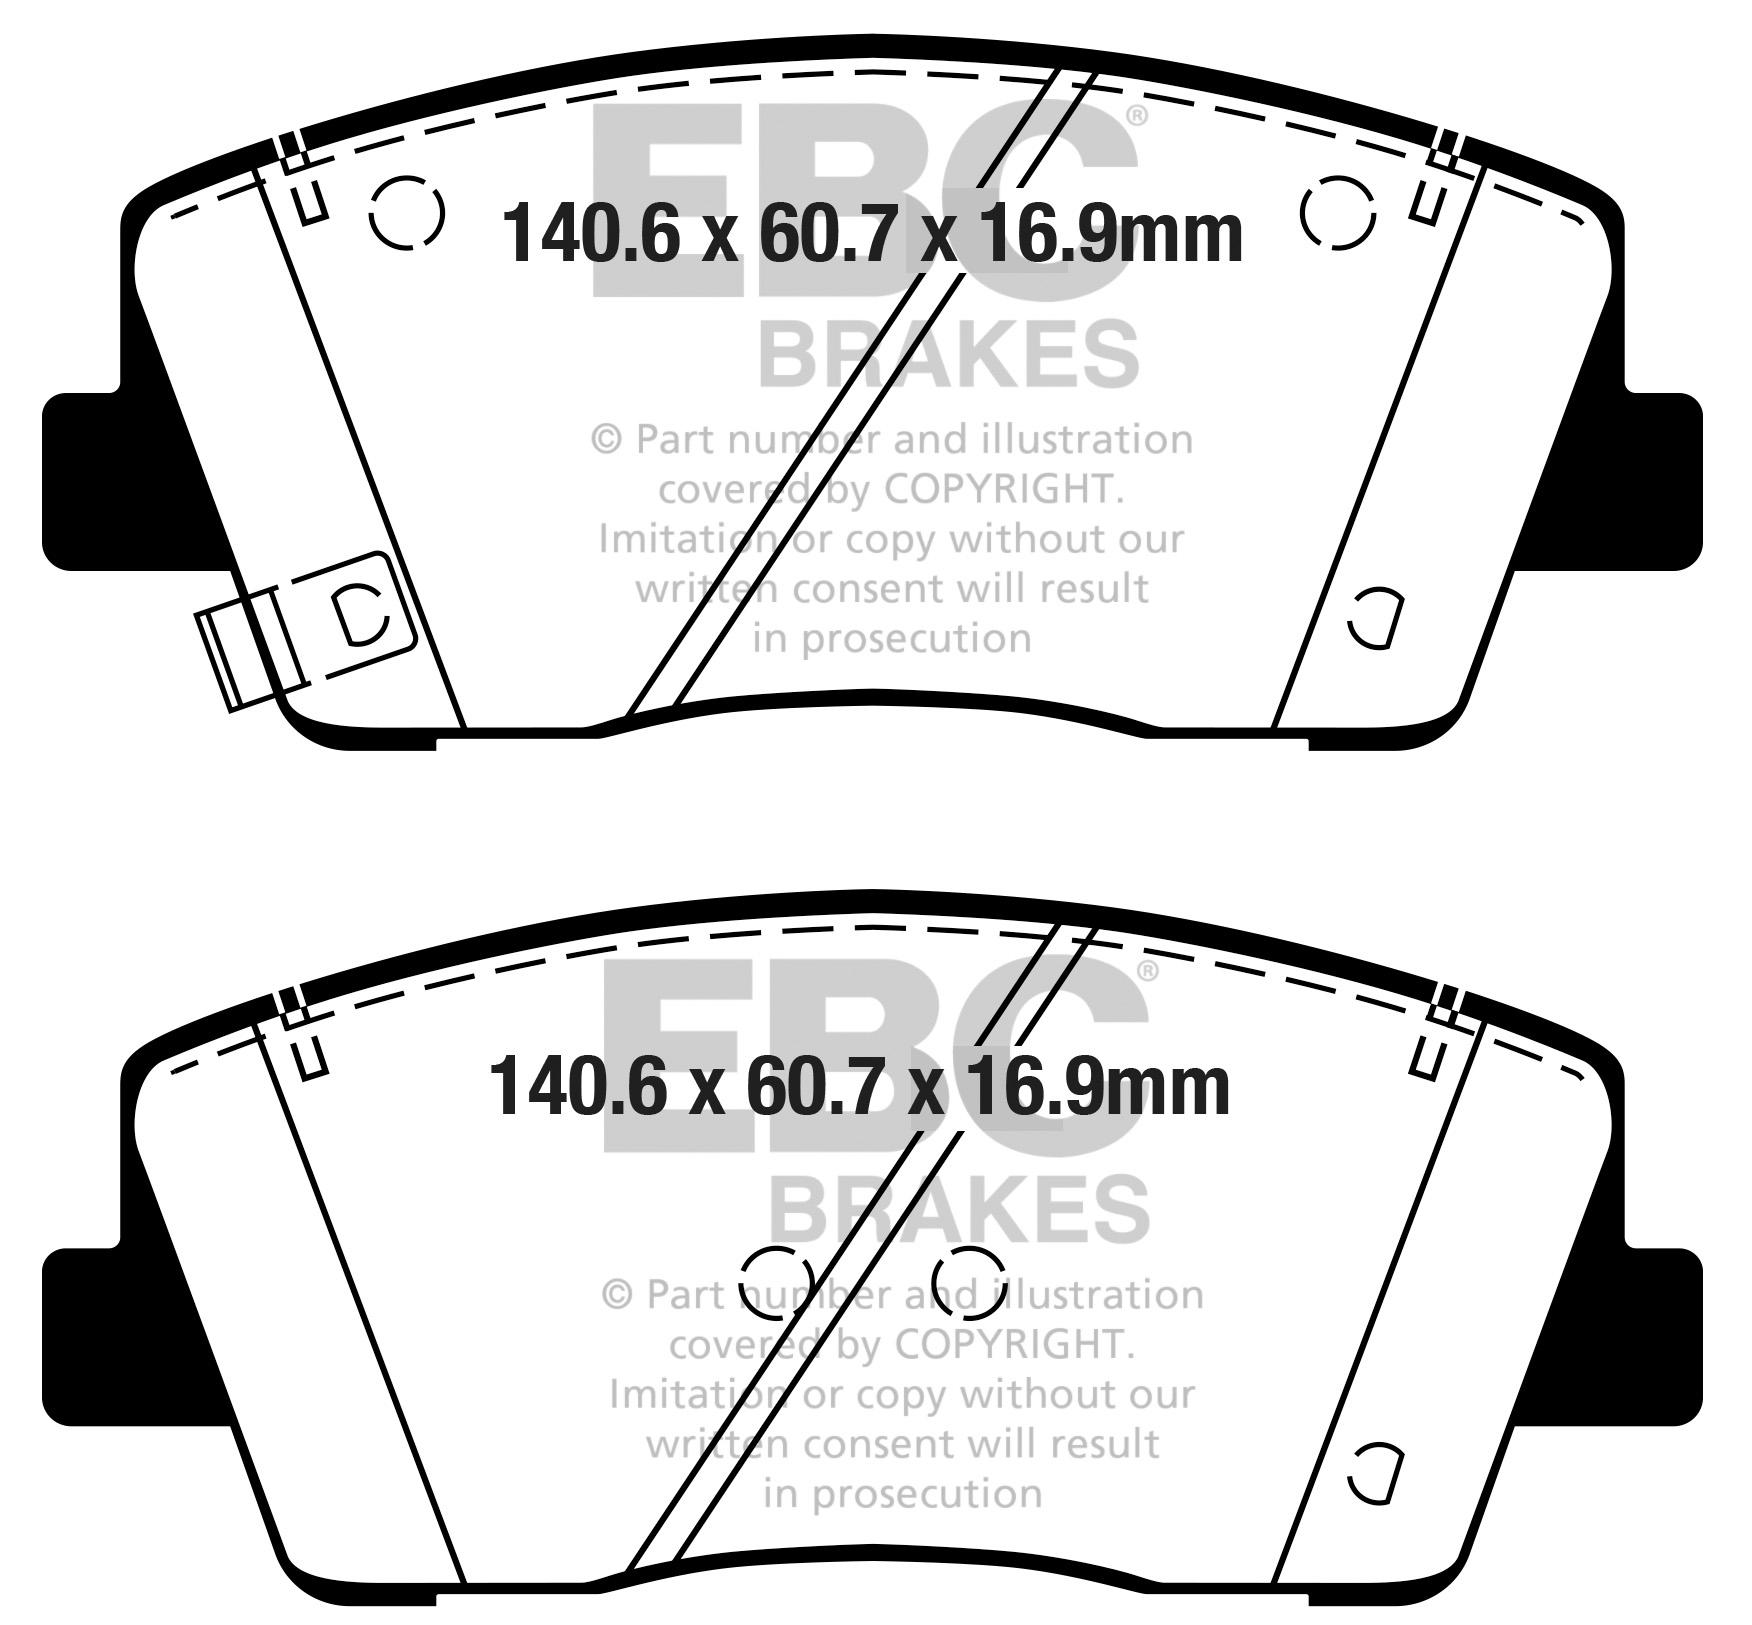 KIA Stinger 2.0 Turbo 2017- - Perfect kes Discs, Pads and ... on kubota diagrams, bmw diagrams, freightliner diagrams, ducati diagrams, ford diagrams, jeep diagrams, corvette diagrams, smart car diagrams, toyota diagrams,